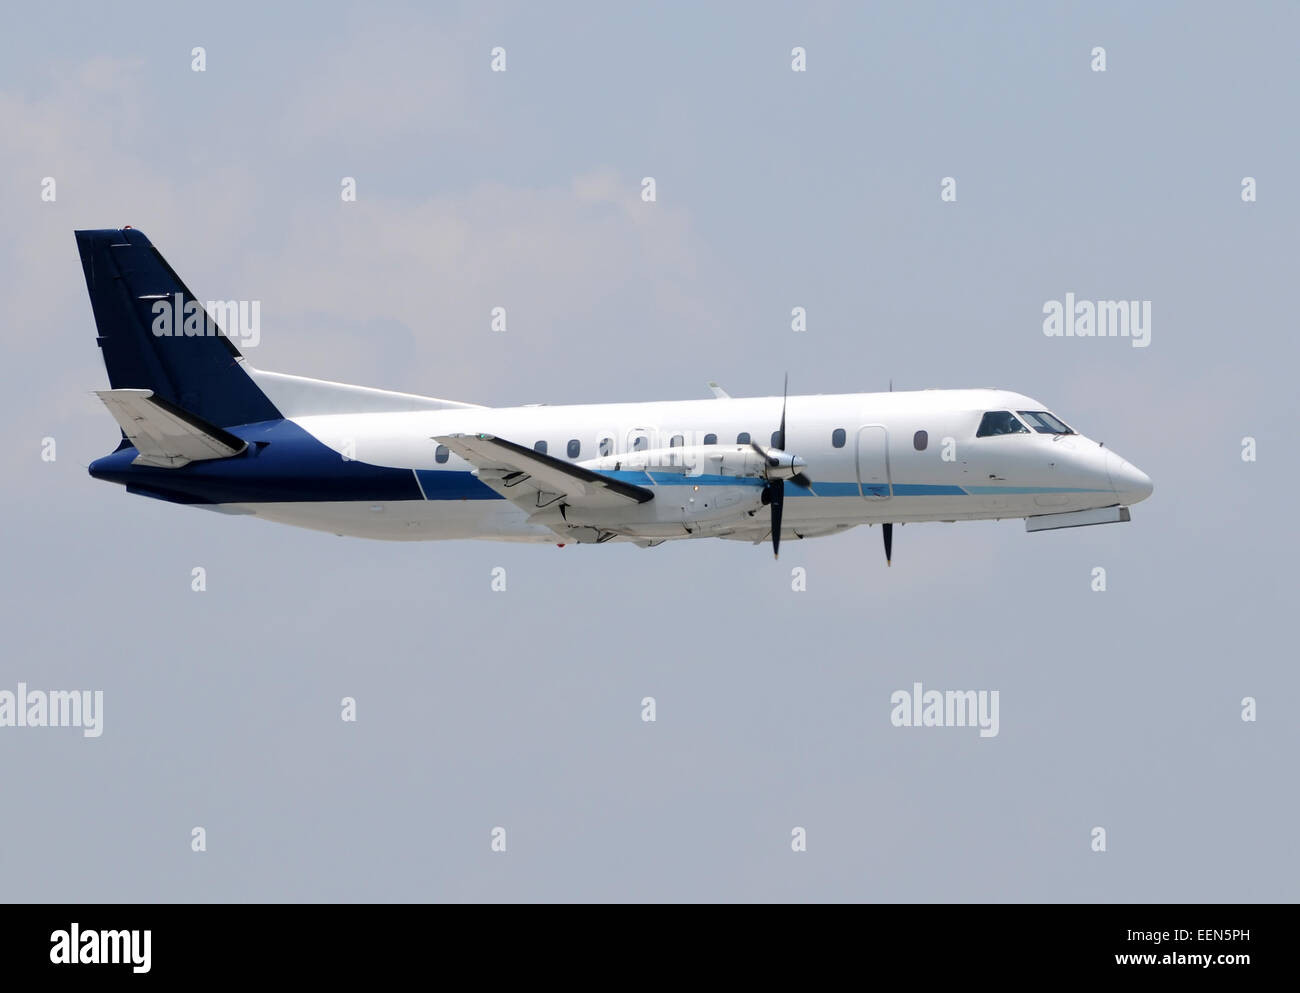 Turboprop airplane used for regional flights - Stock Image